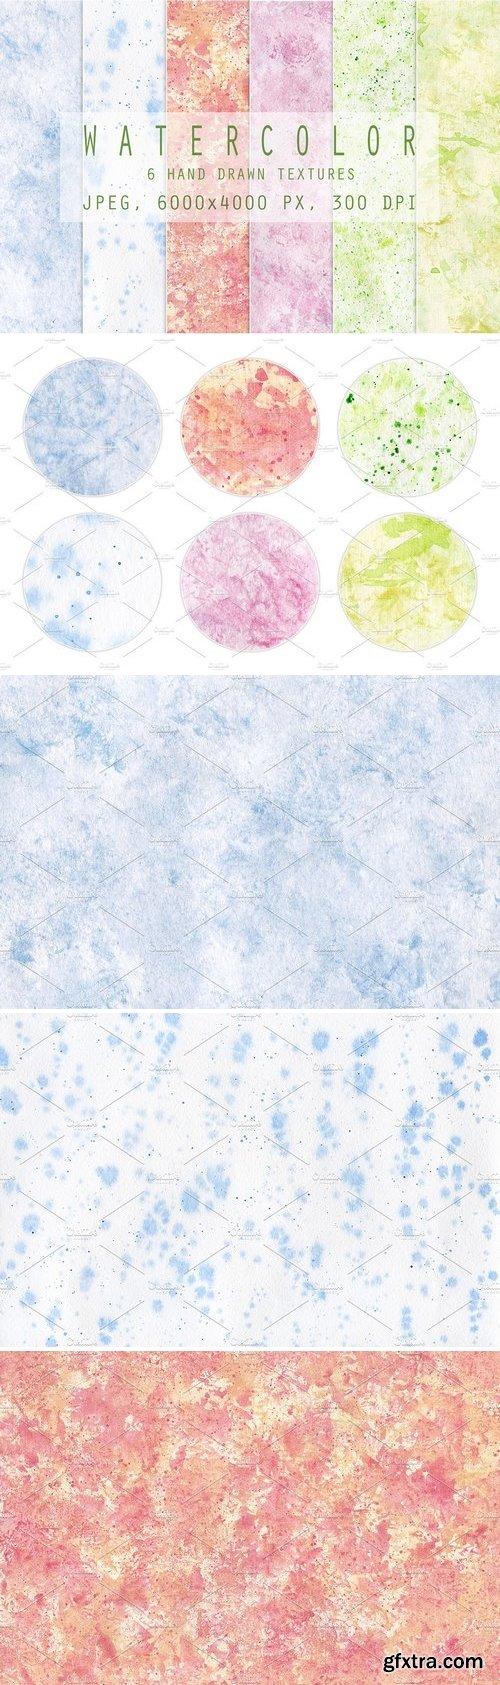 CM - Set of watercolor textures 1452007